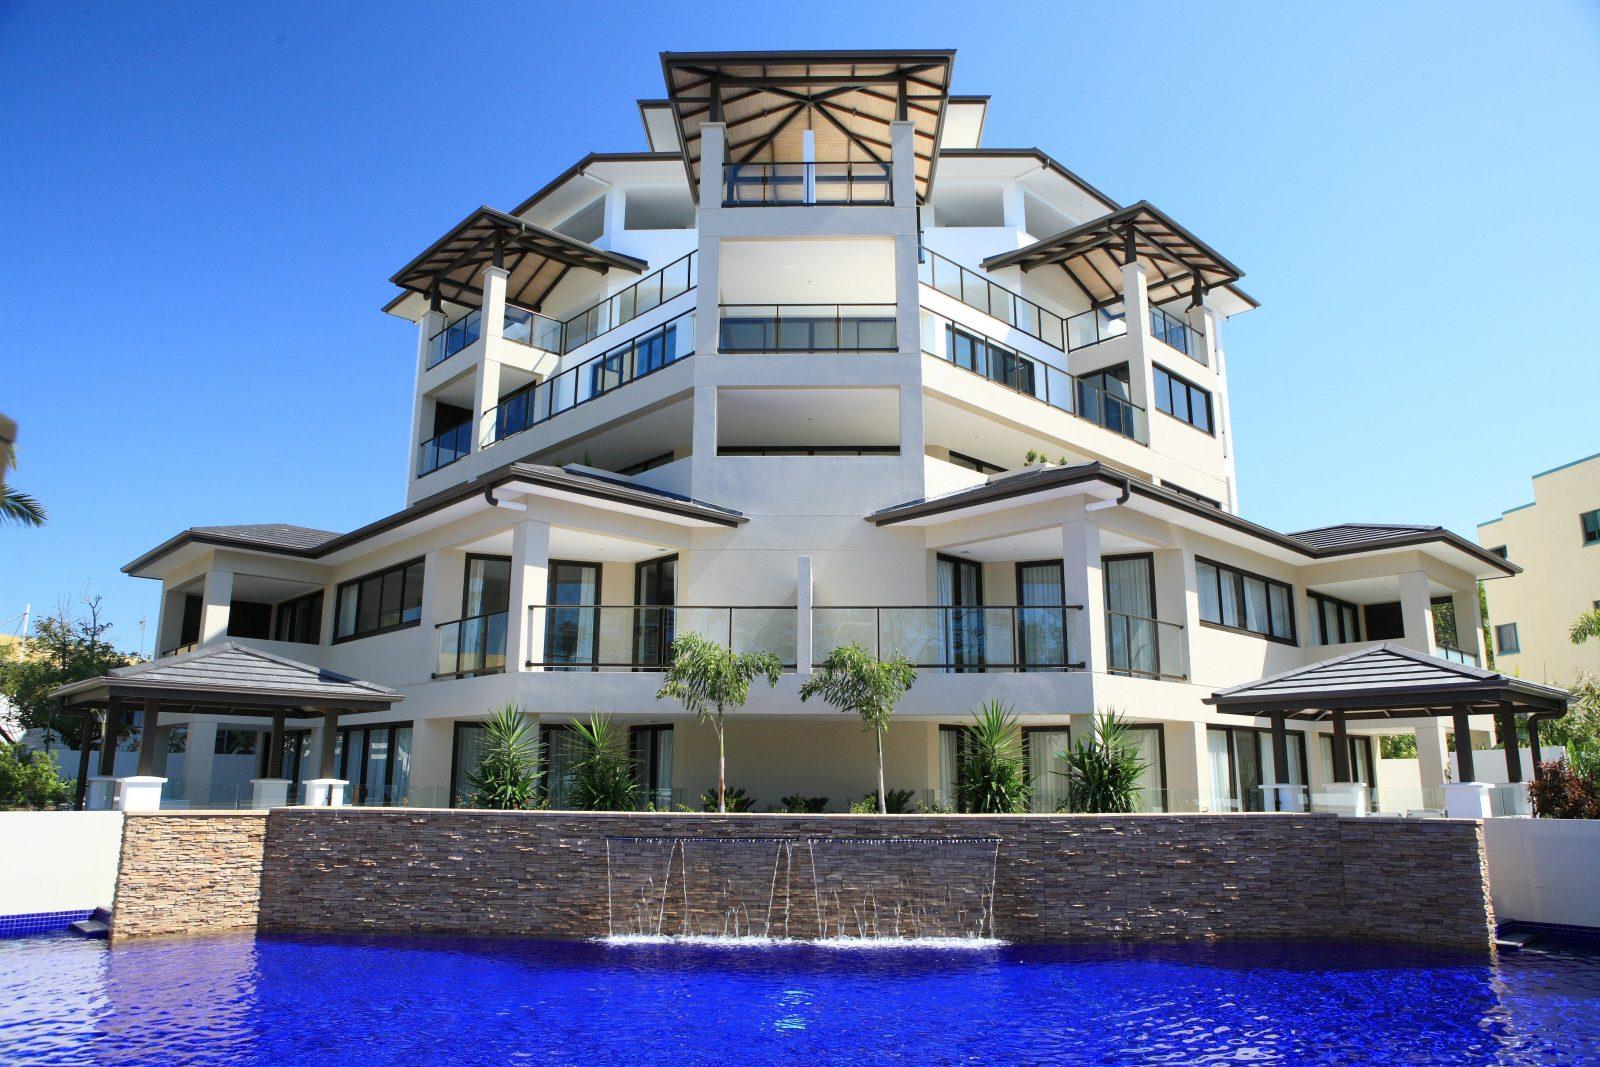 Grand Mercure Allegra Apartments